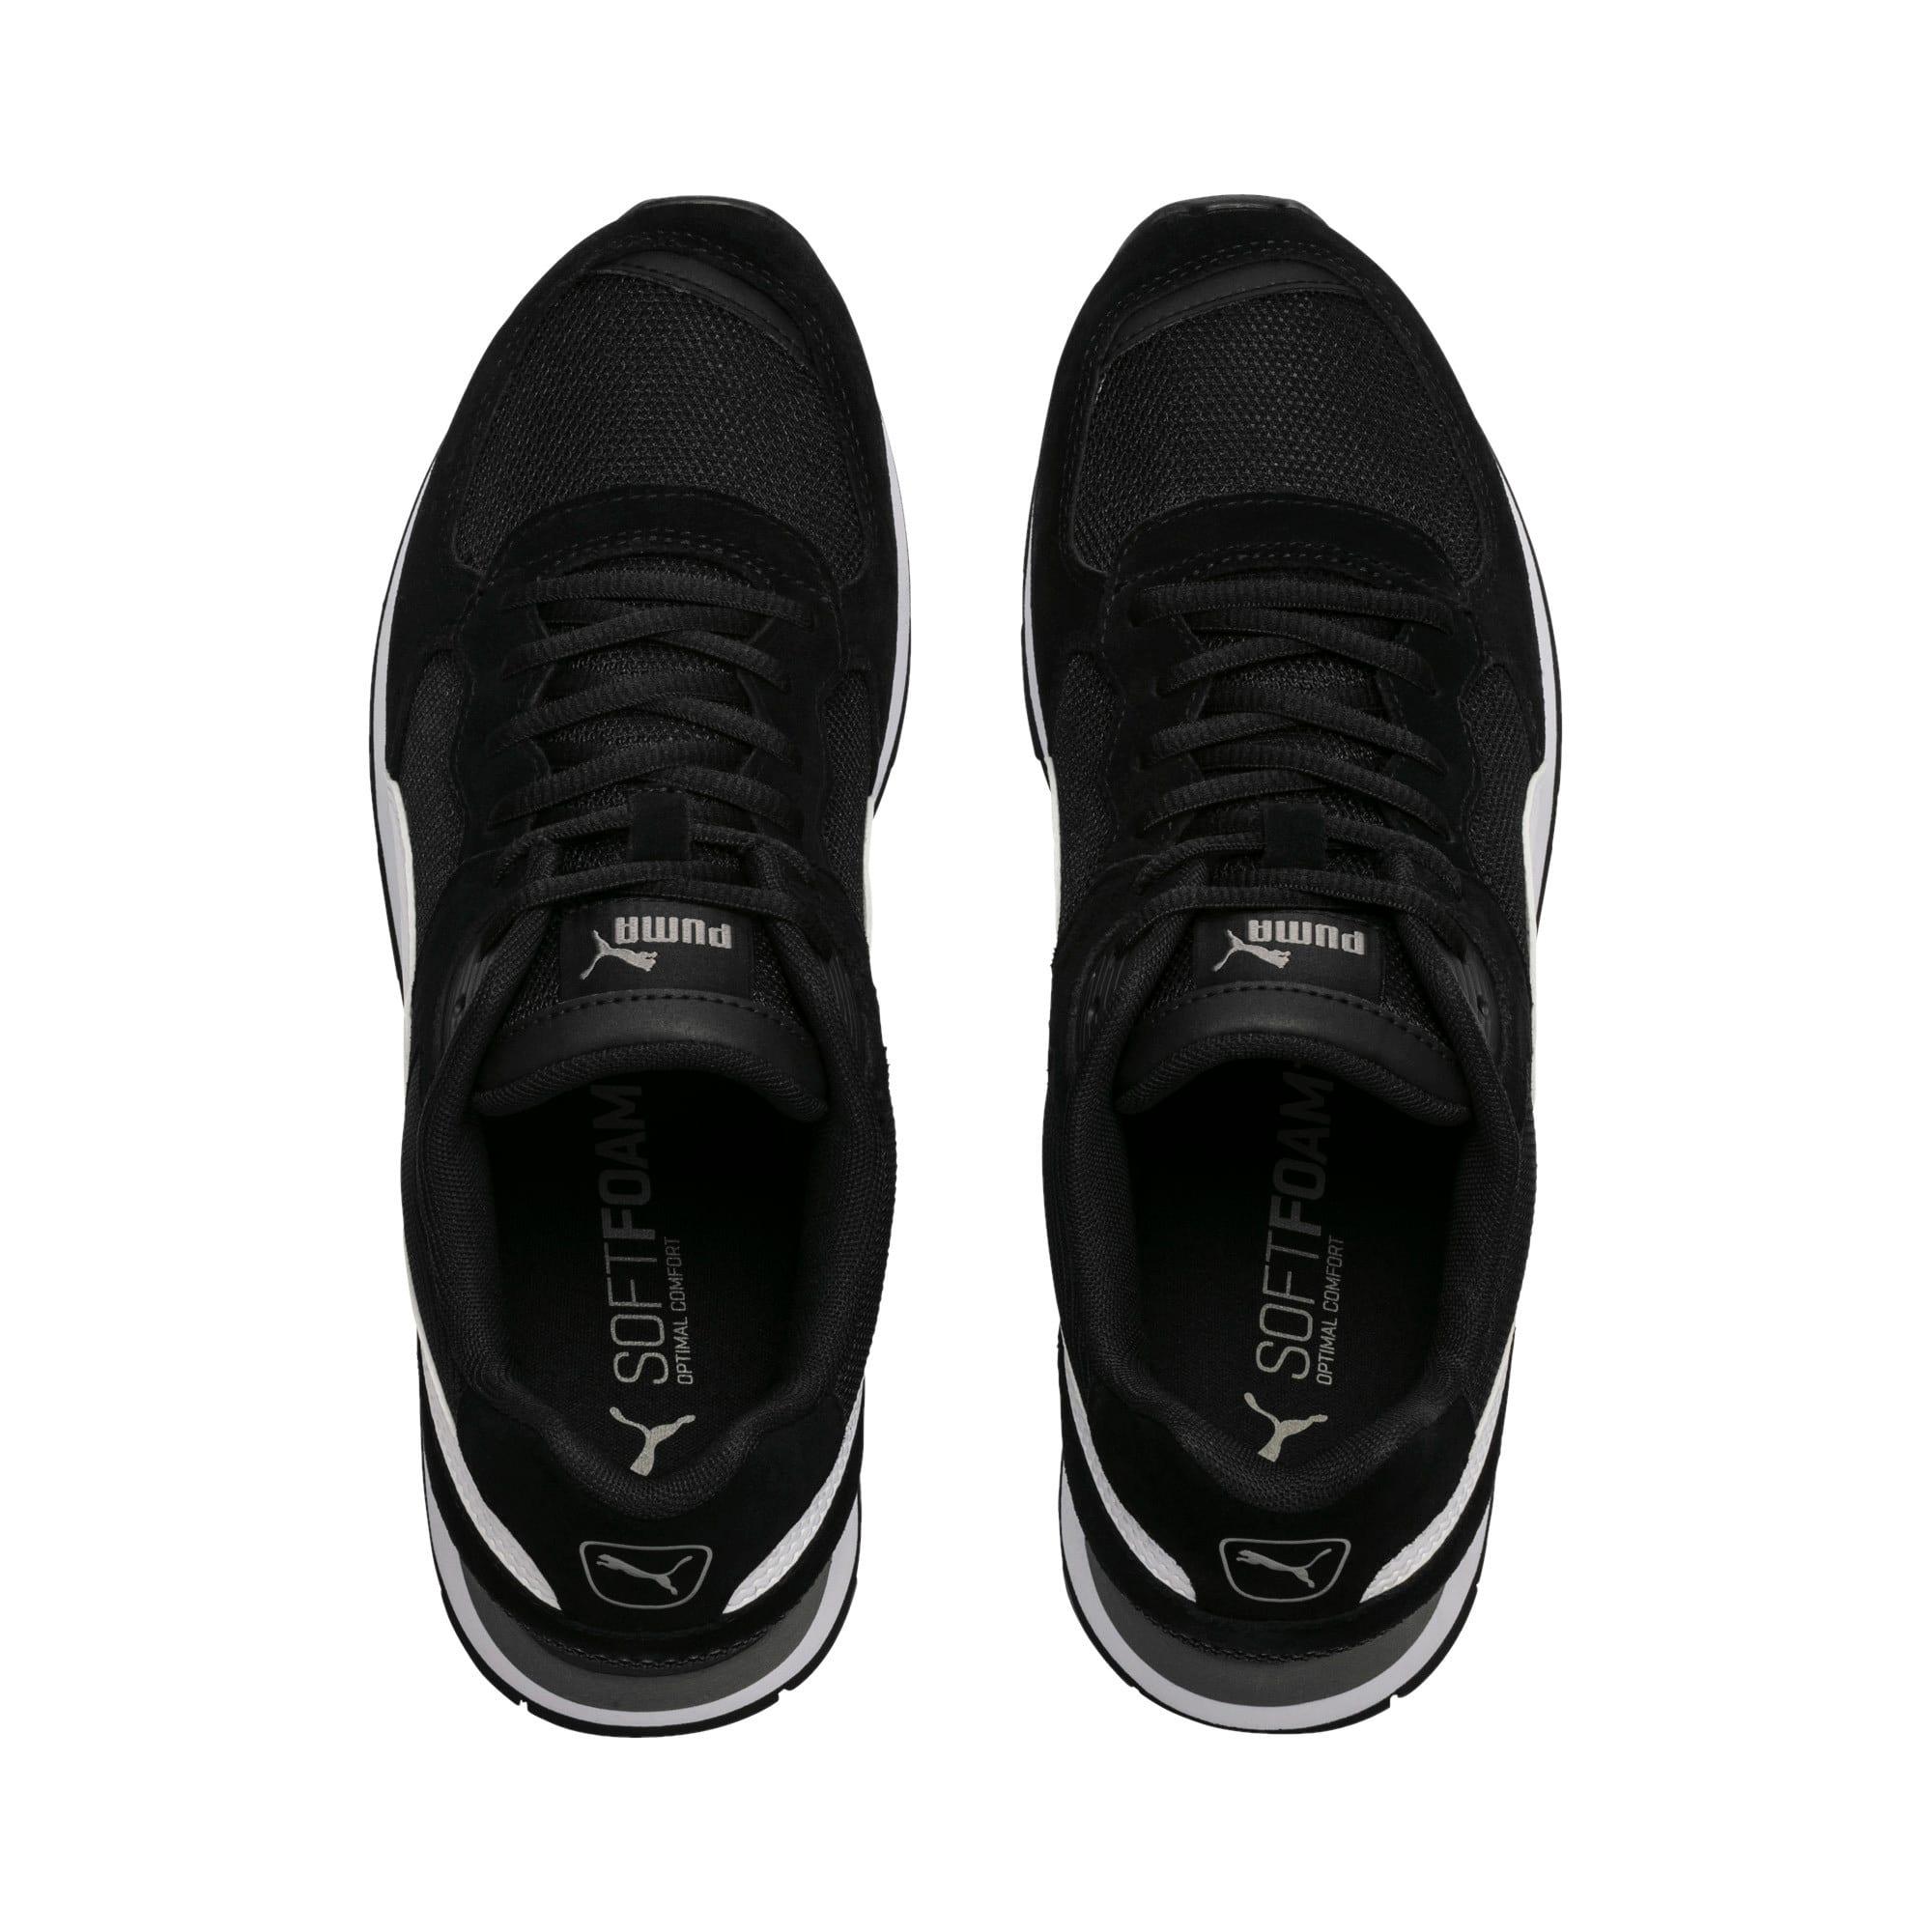 Miniatura 7 de Zapatos deportivos Vista, Black-White-Charcoal Gray, mediano